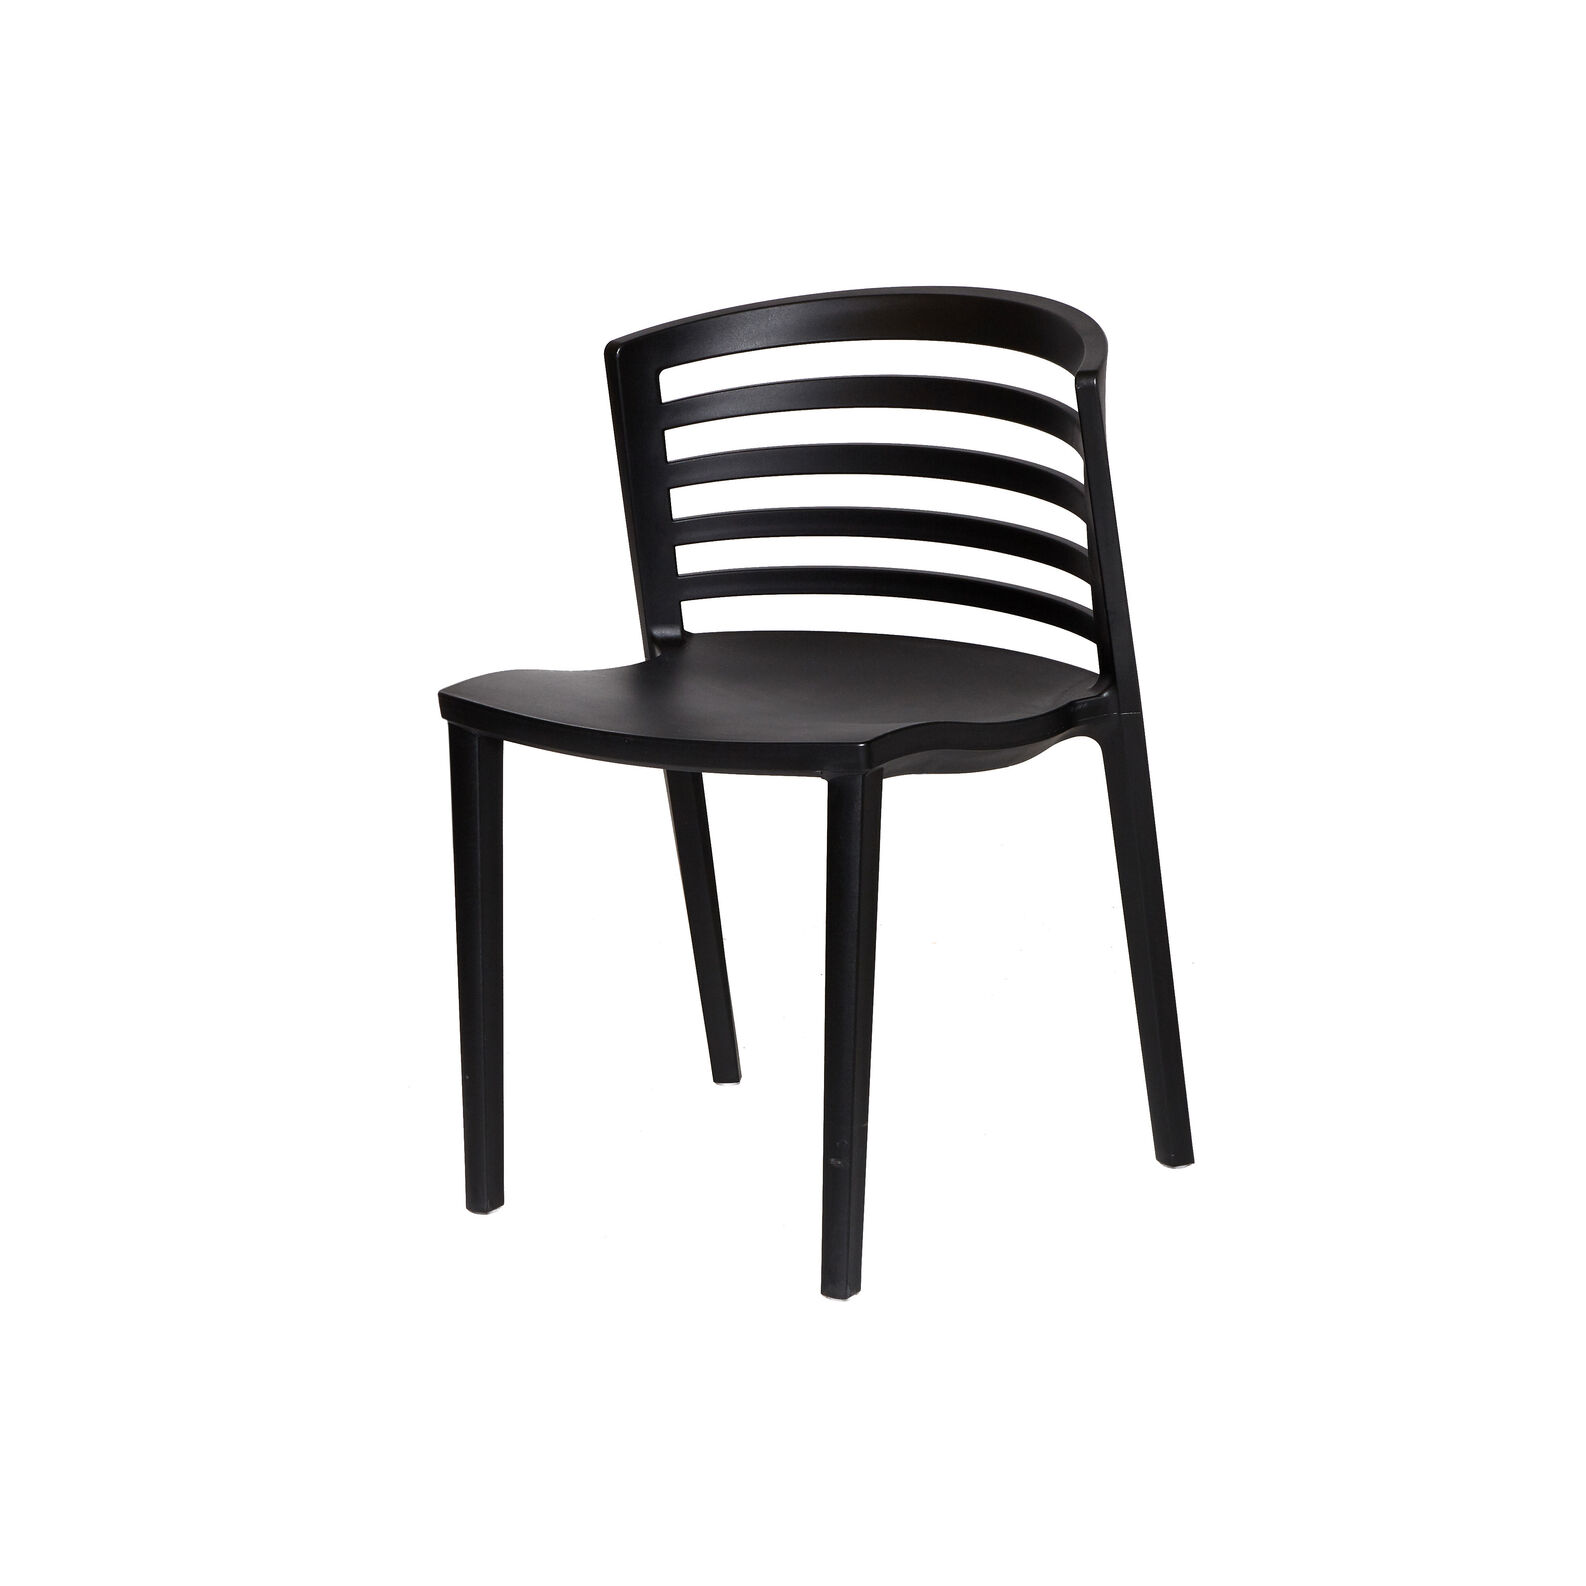 Venezia fibreglass and plastic chair